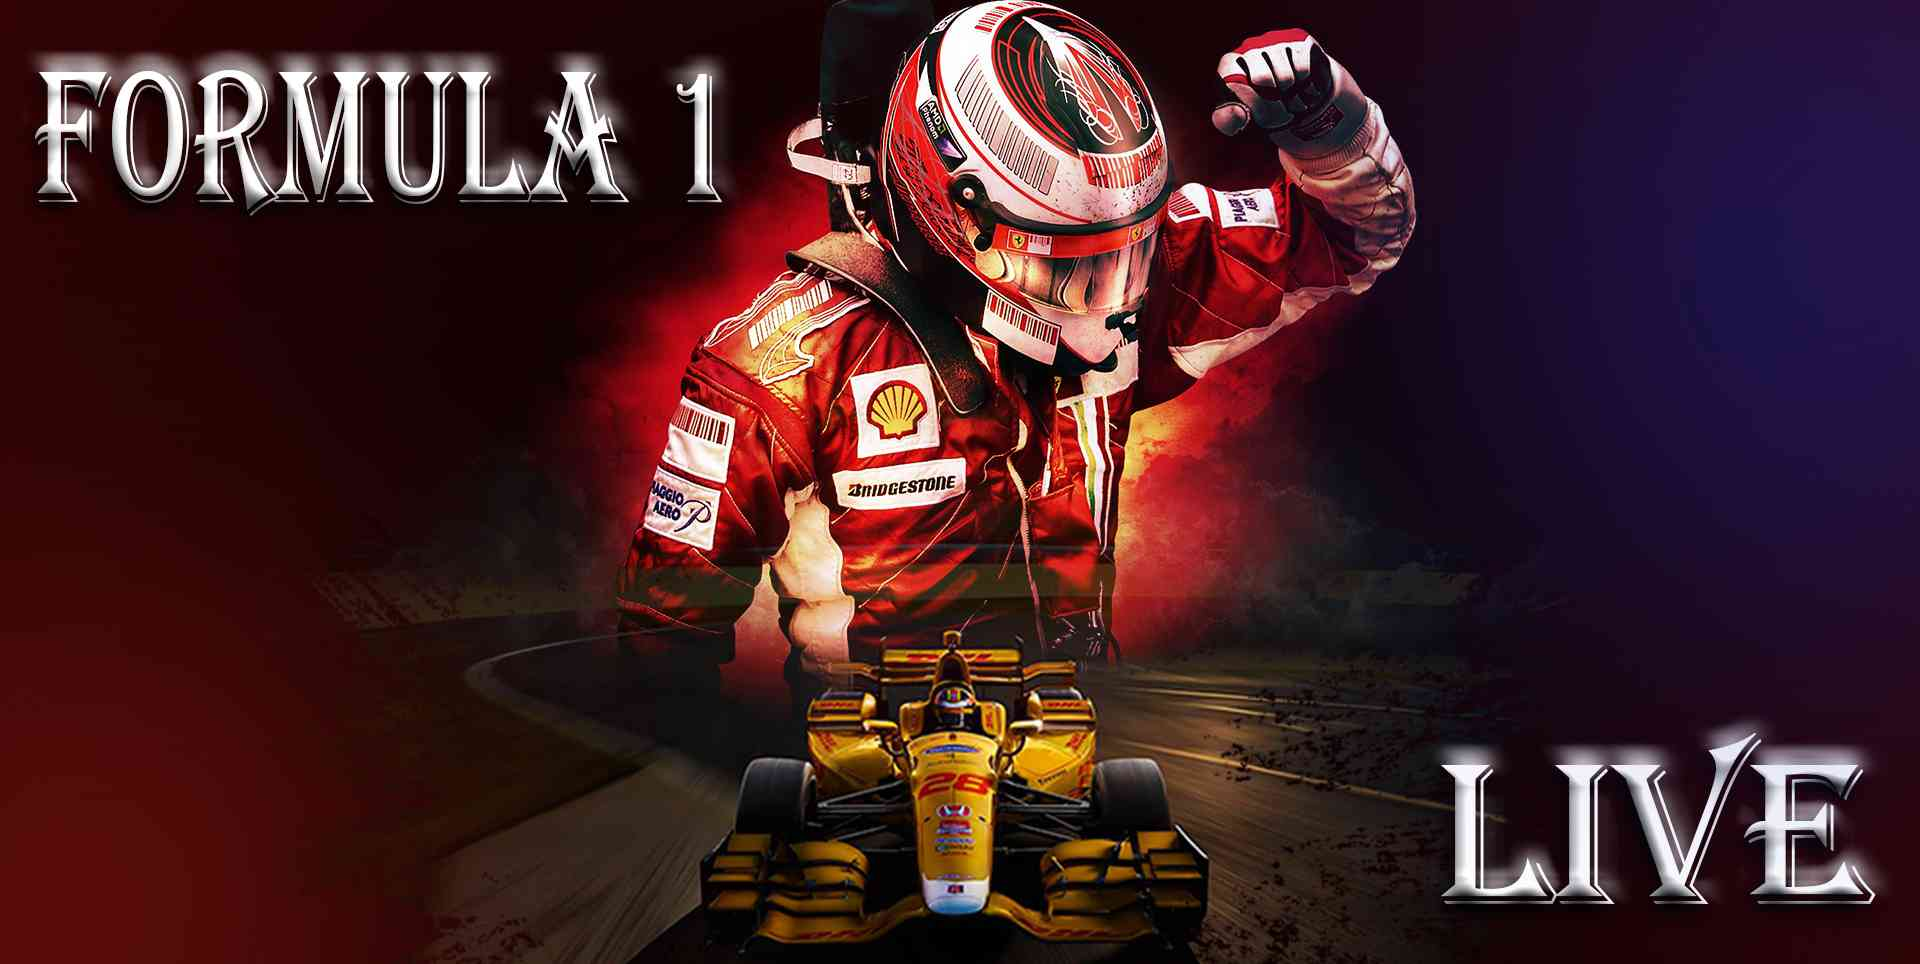 Hungarian Grand Prix 2016 Streaming